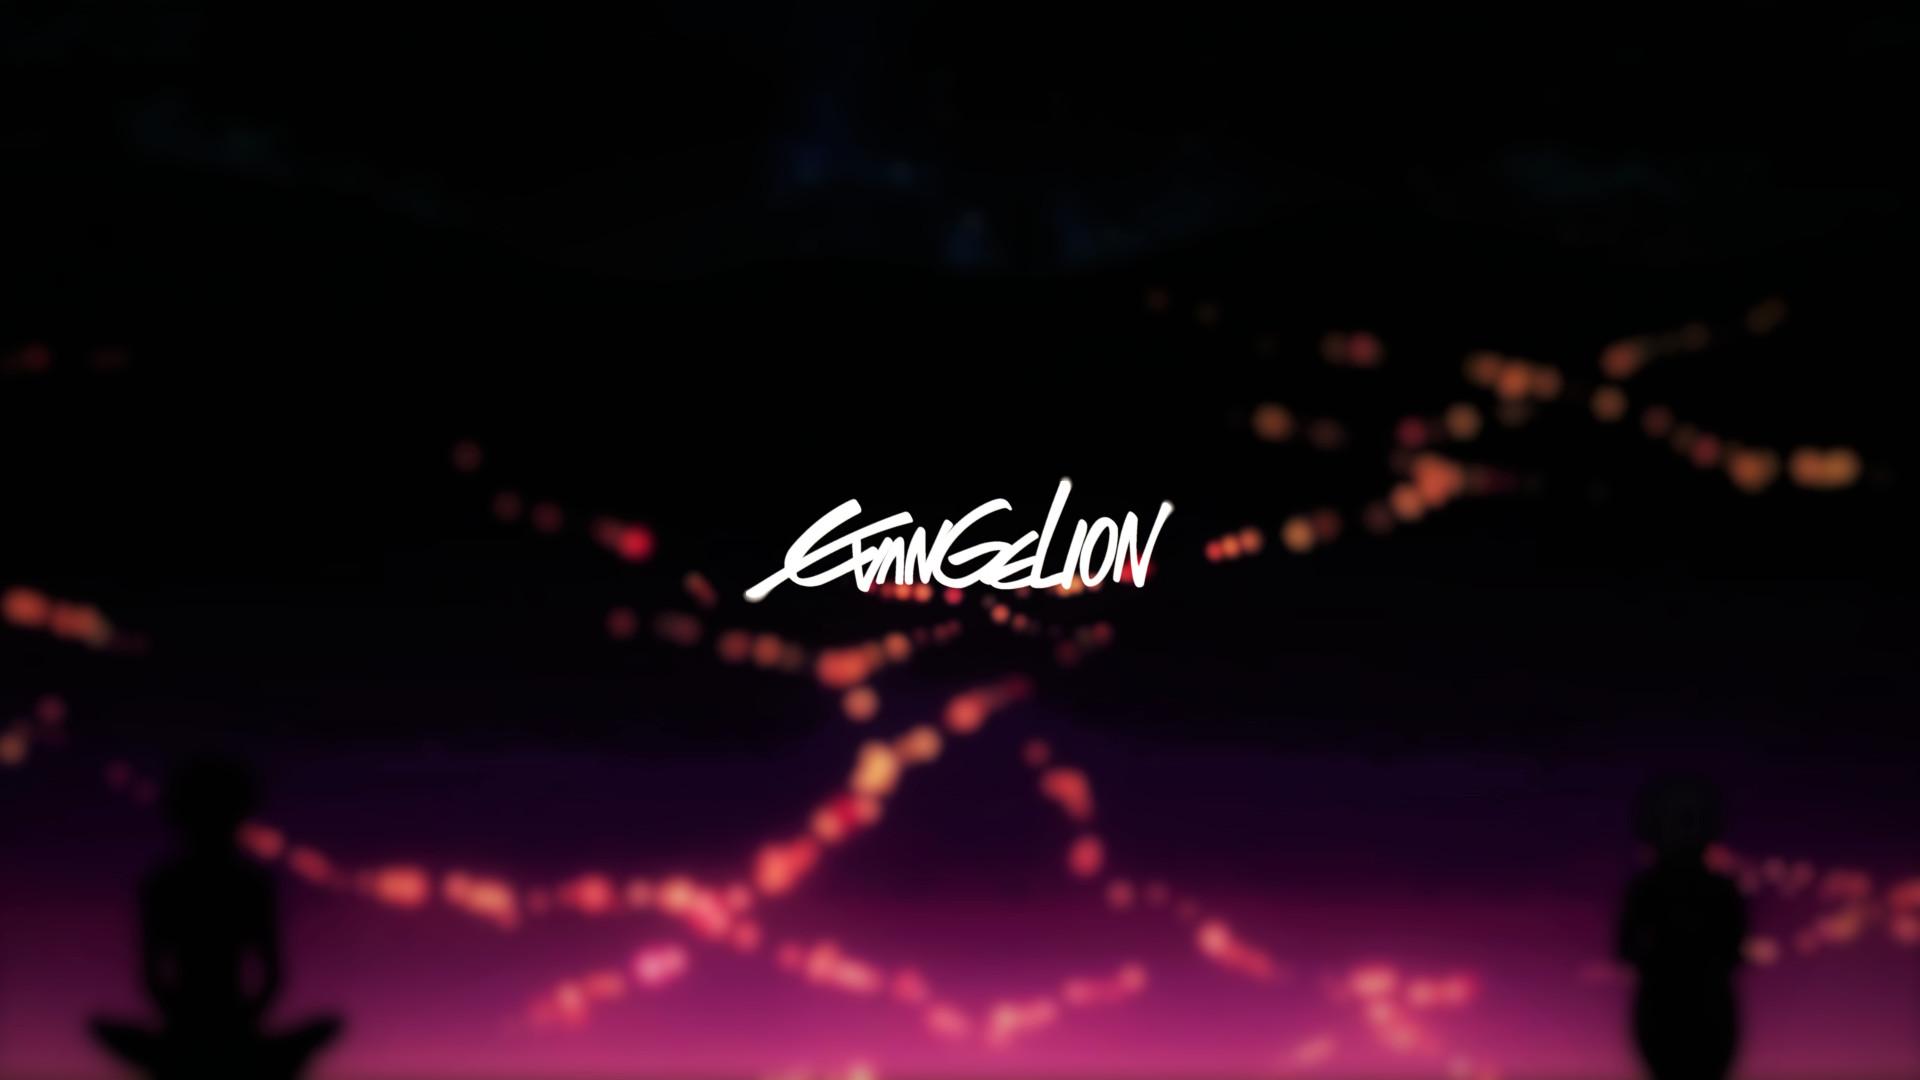 Evangelion Wallpaper HD (72+ images)